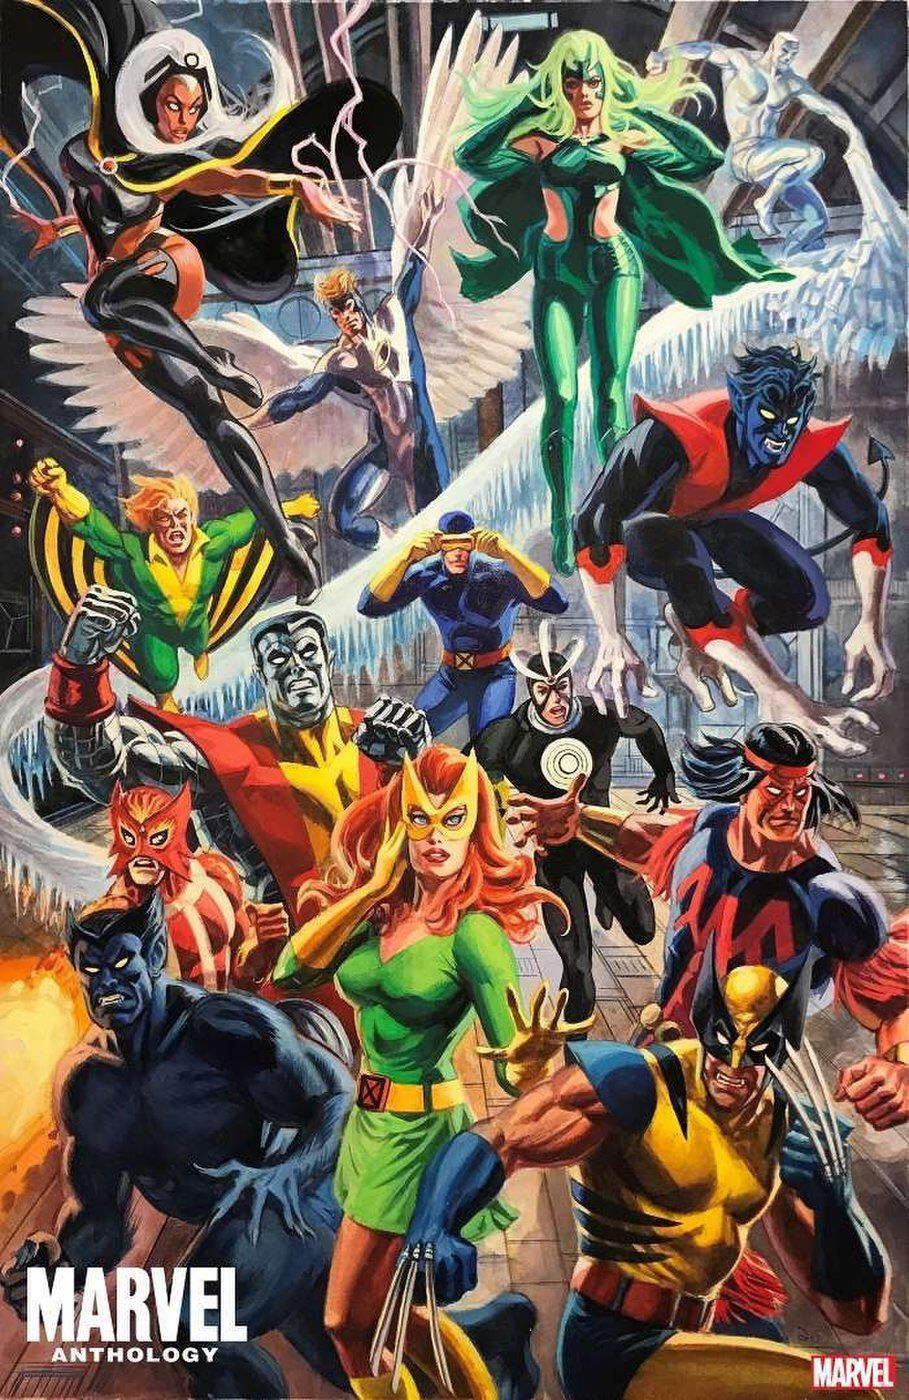 Marvel Anthology Interior Art The X Men By Dan Brereton In 2020 Comics Comic Book Artwork Marvel Comics Art